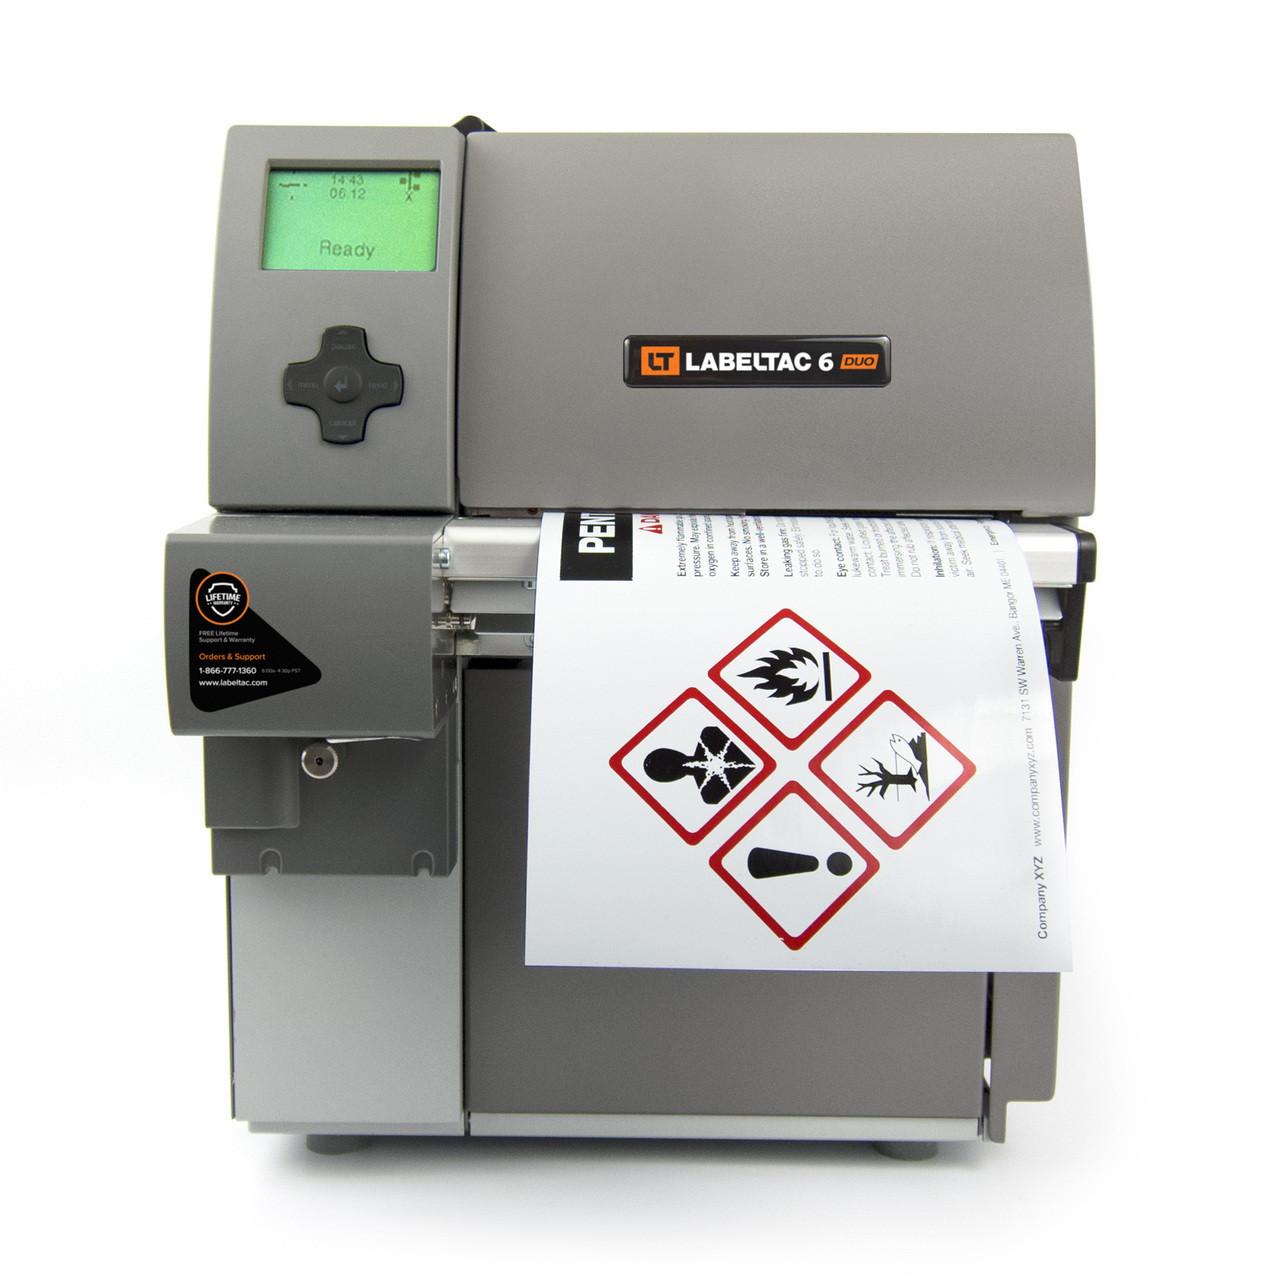 Color printer label - Ghs Label Printer